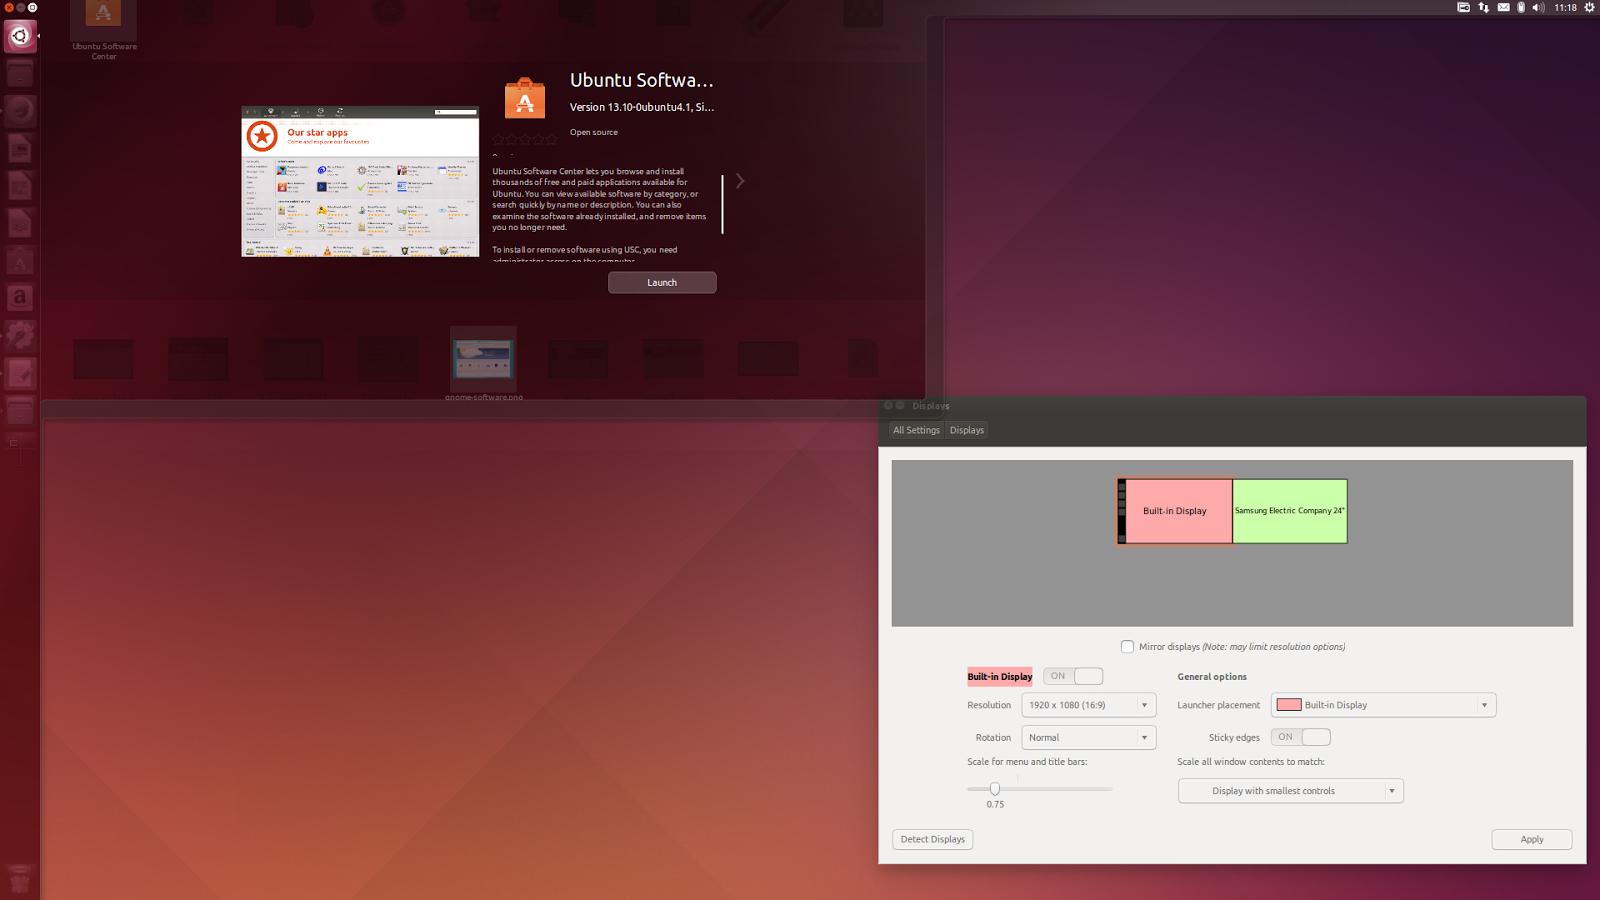 Compulab utilite 2 ubuntu mini pc launches for $ 192 - a new ubuntu mini pc has b